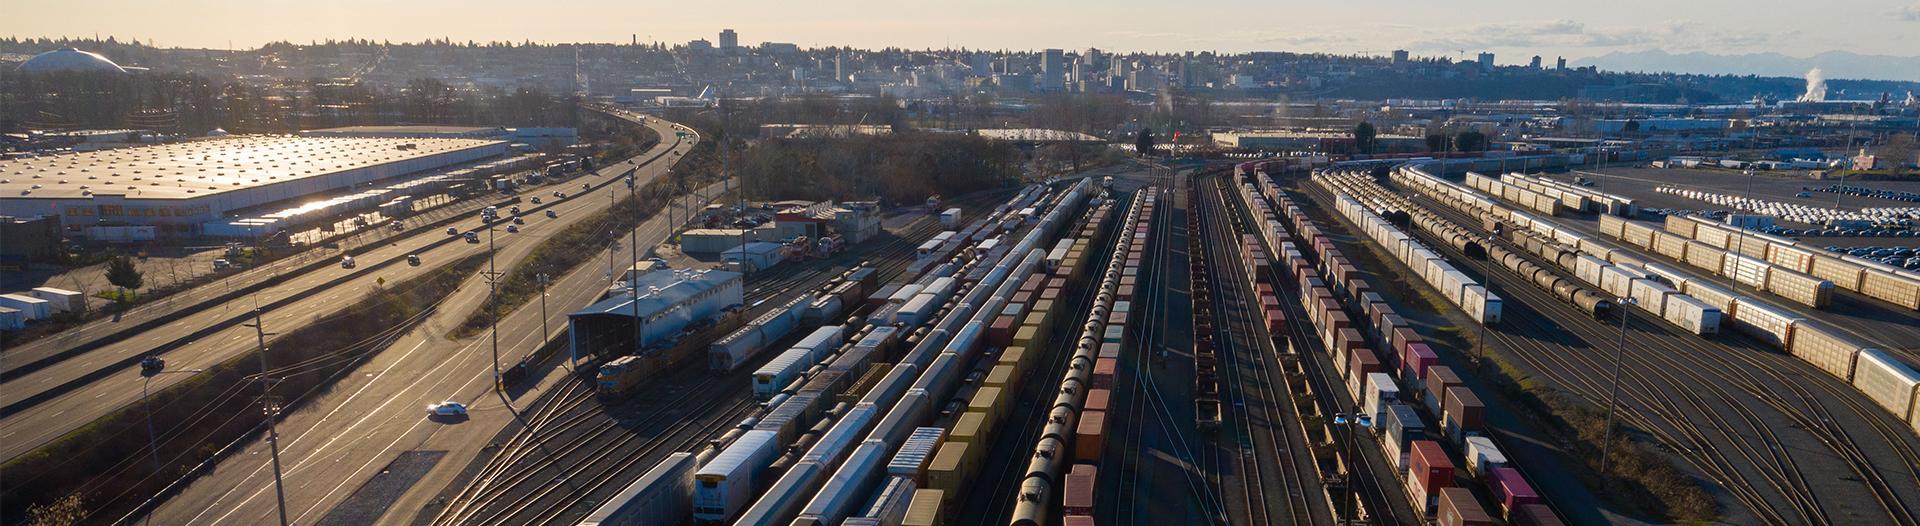 photo of a rail yard